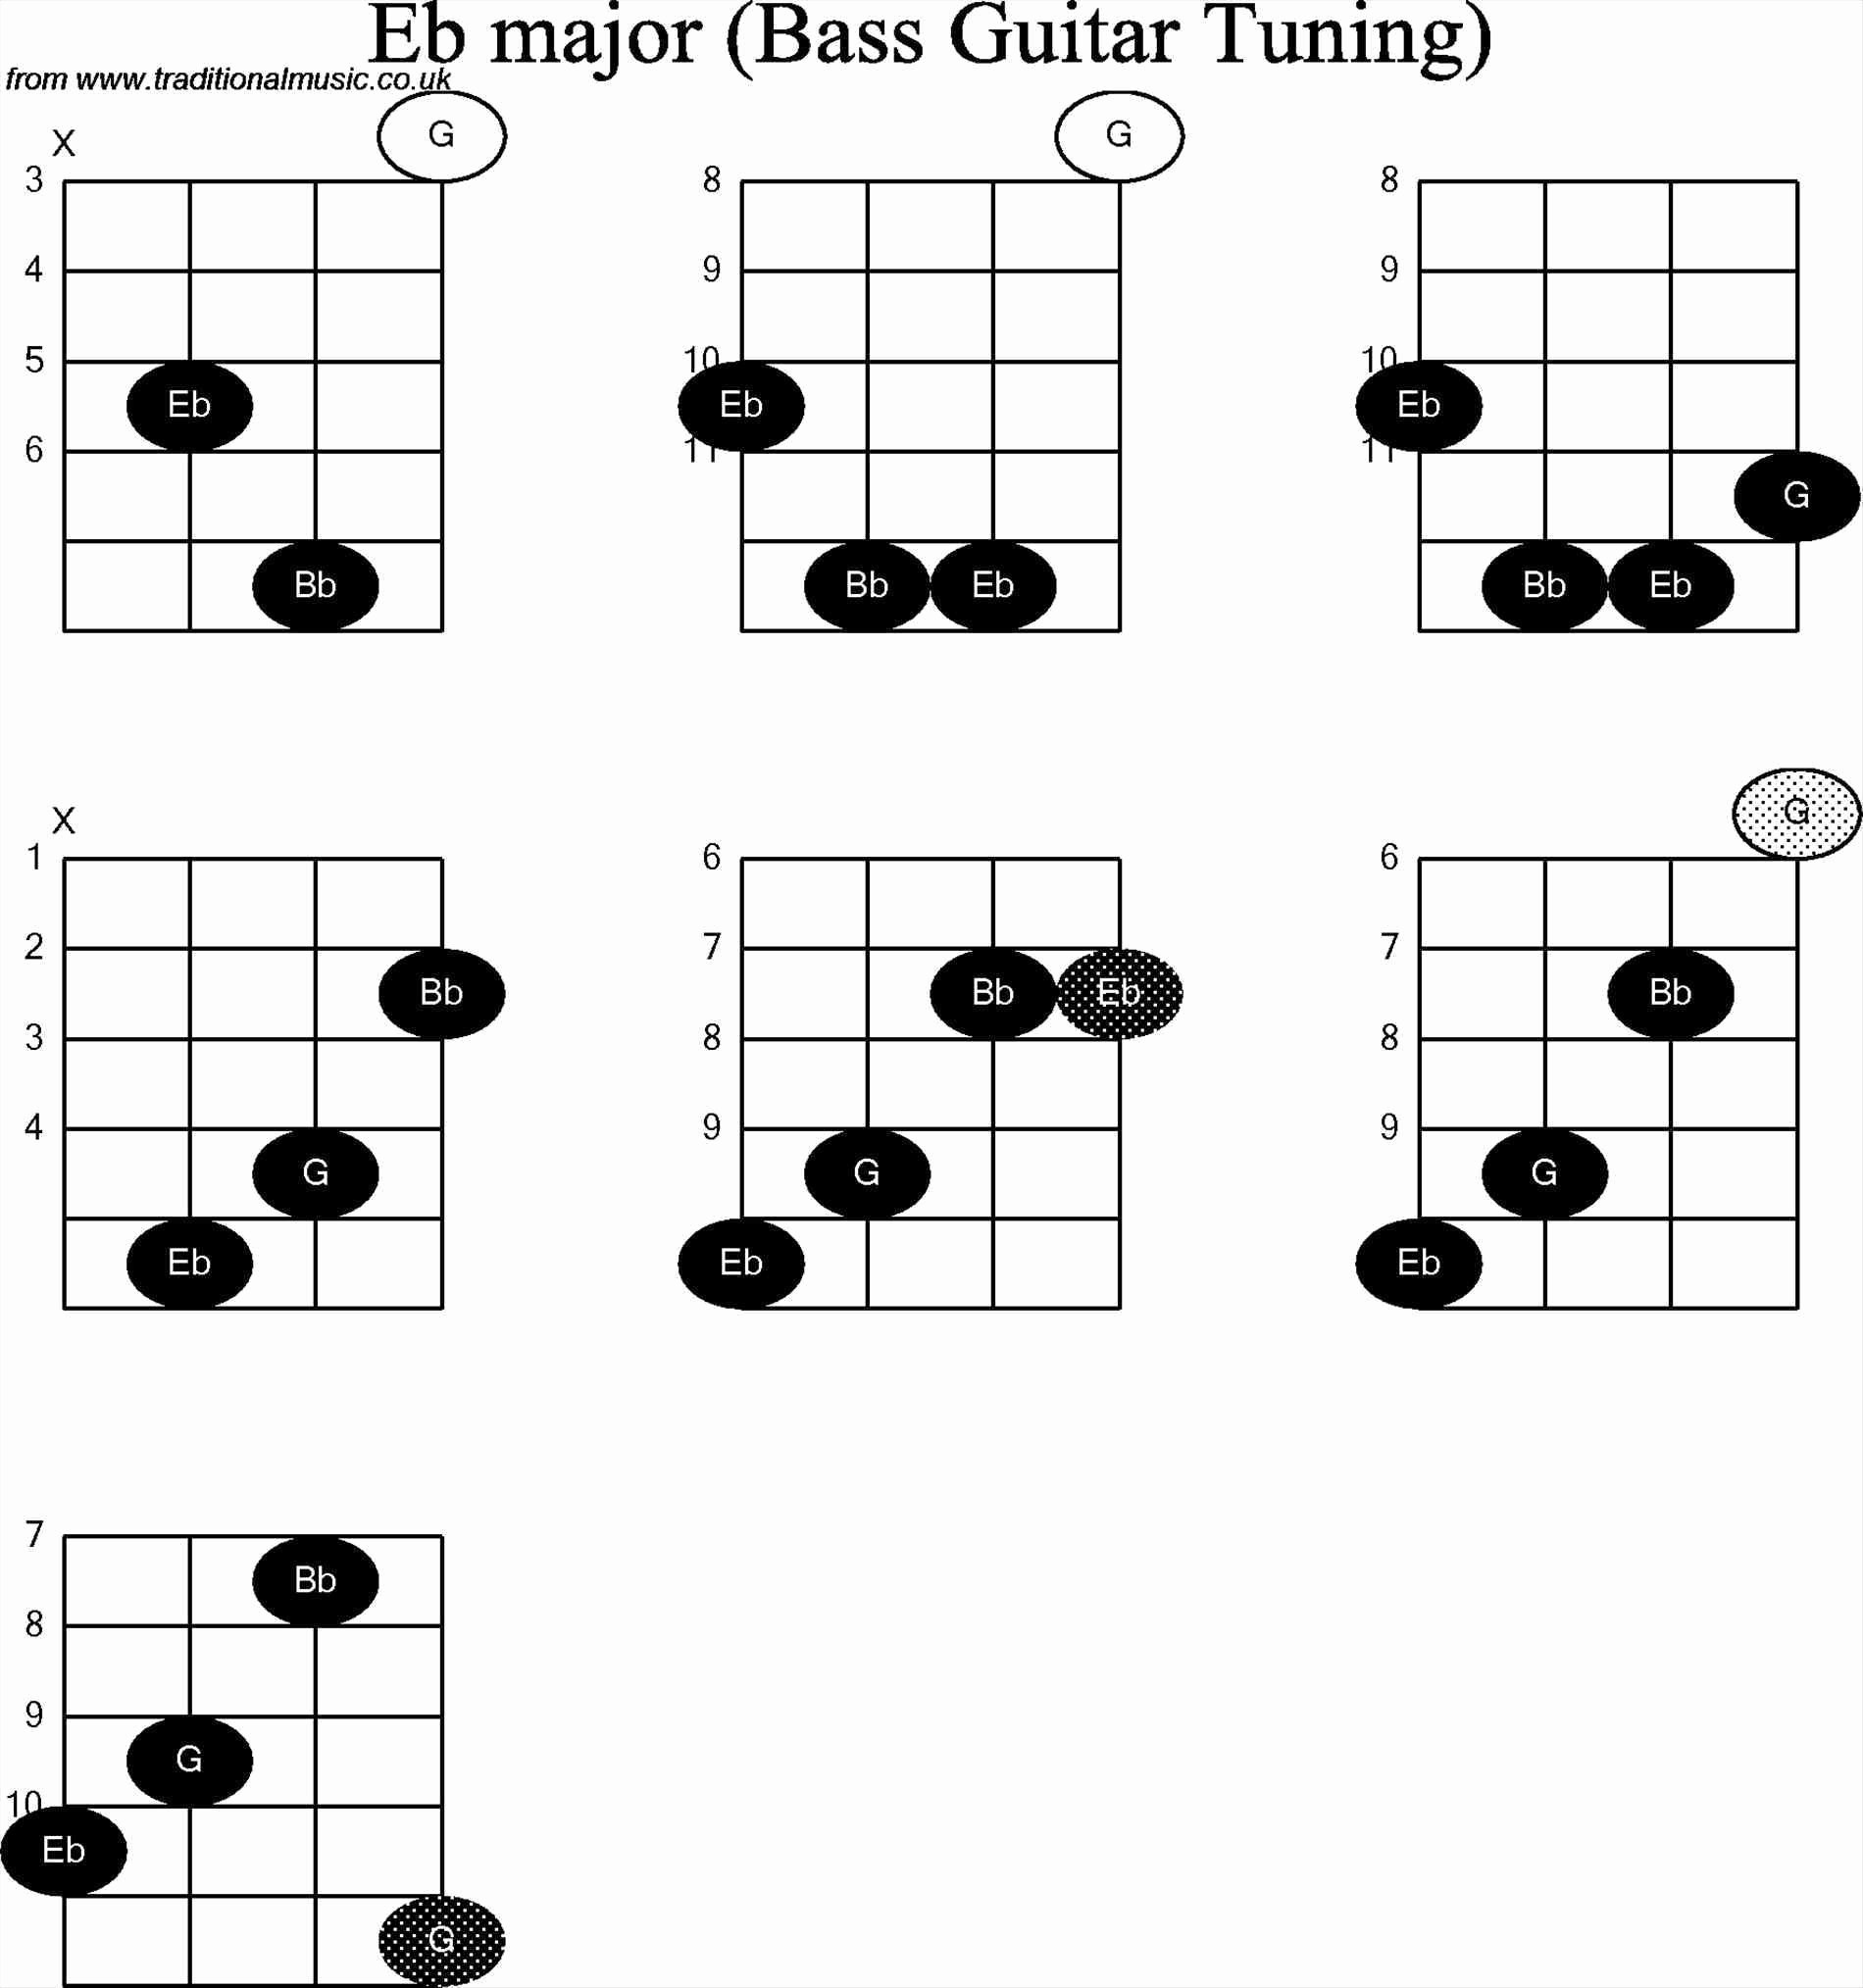 Bass Chords Chart | Accomplice Music - Free Printable Bass Guitar Chord Chart